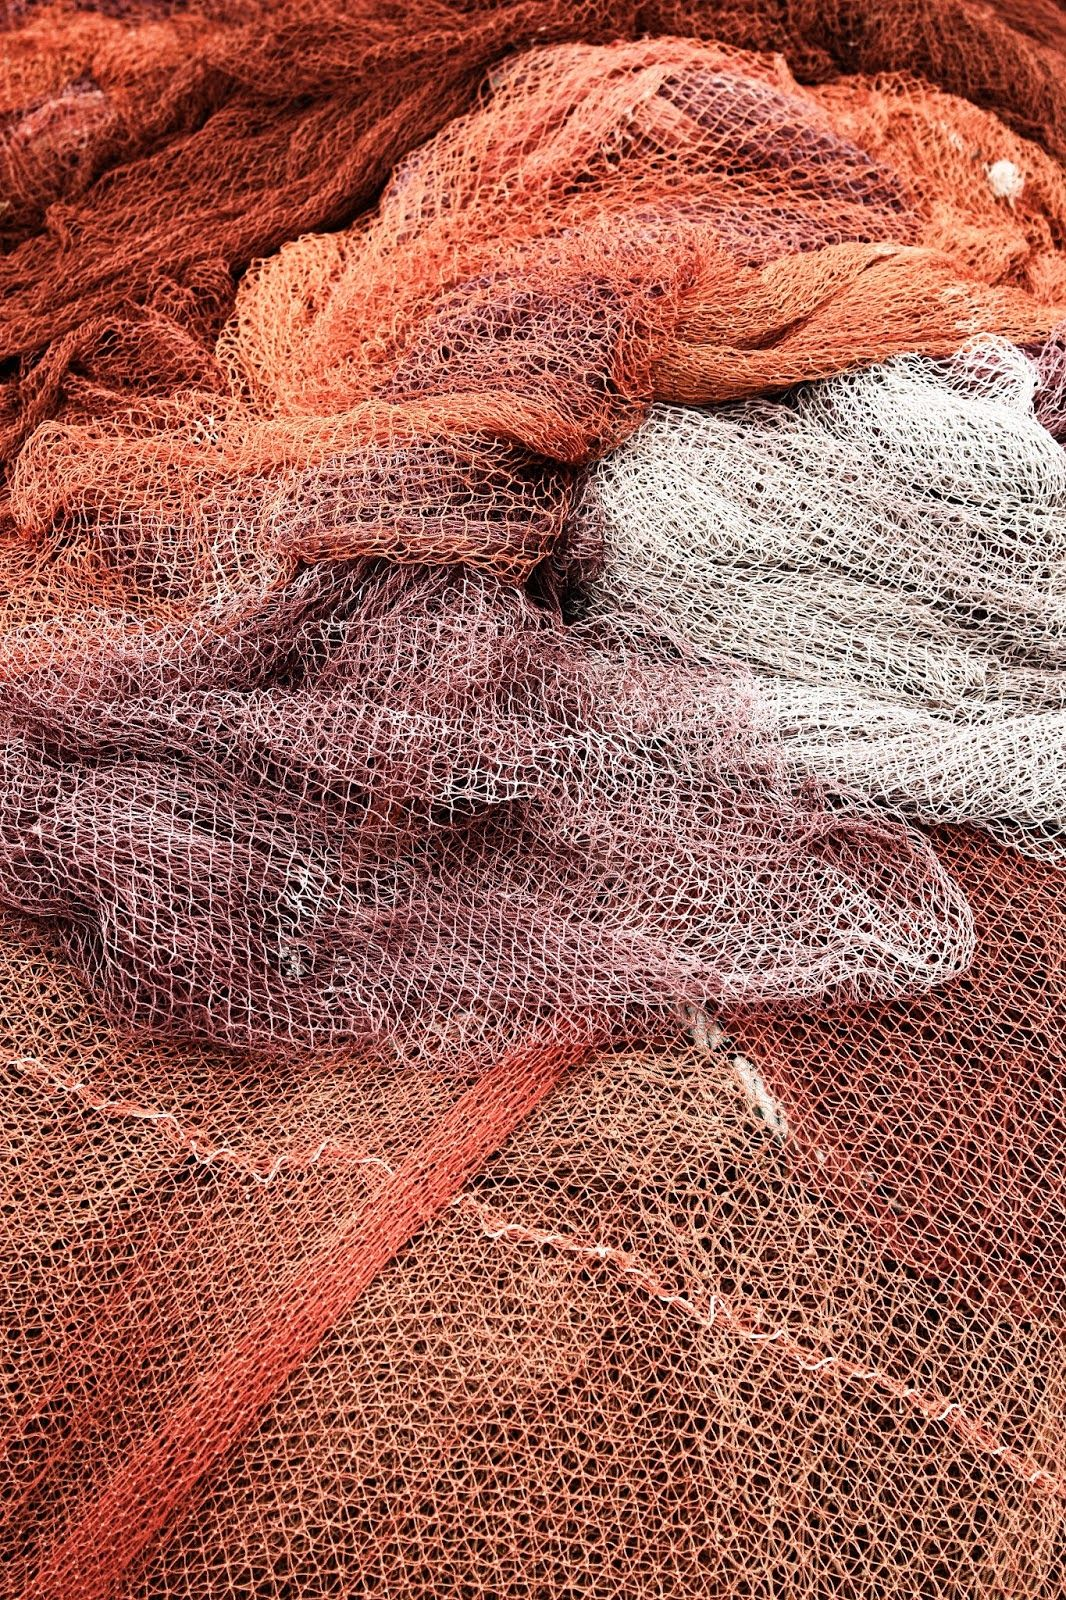 great colors blending well together | net dress ideas | Pinterest